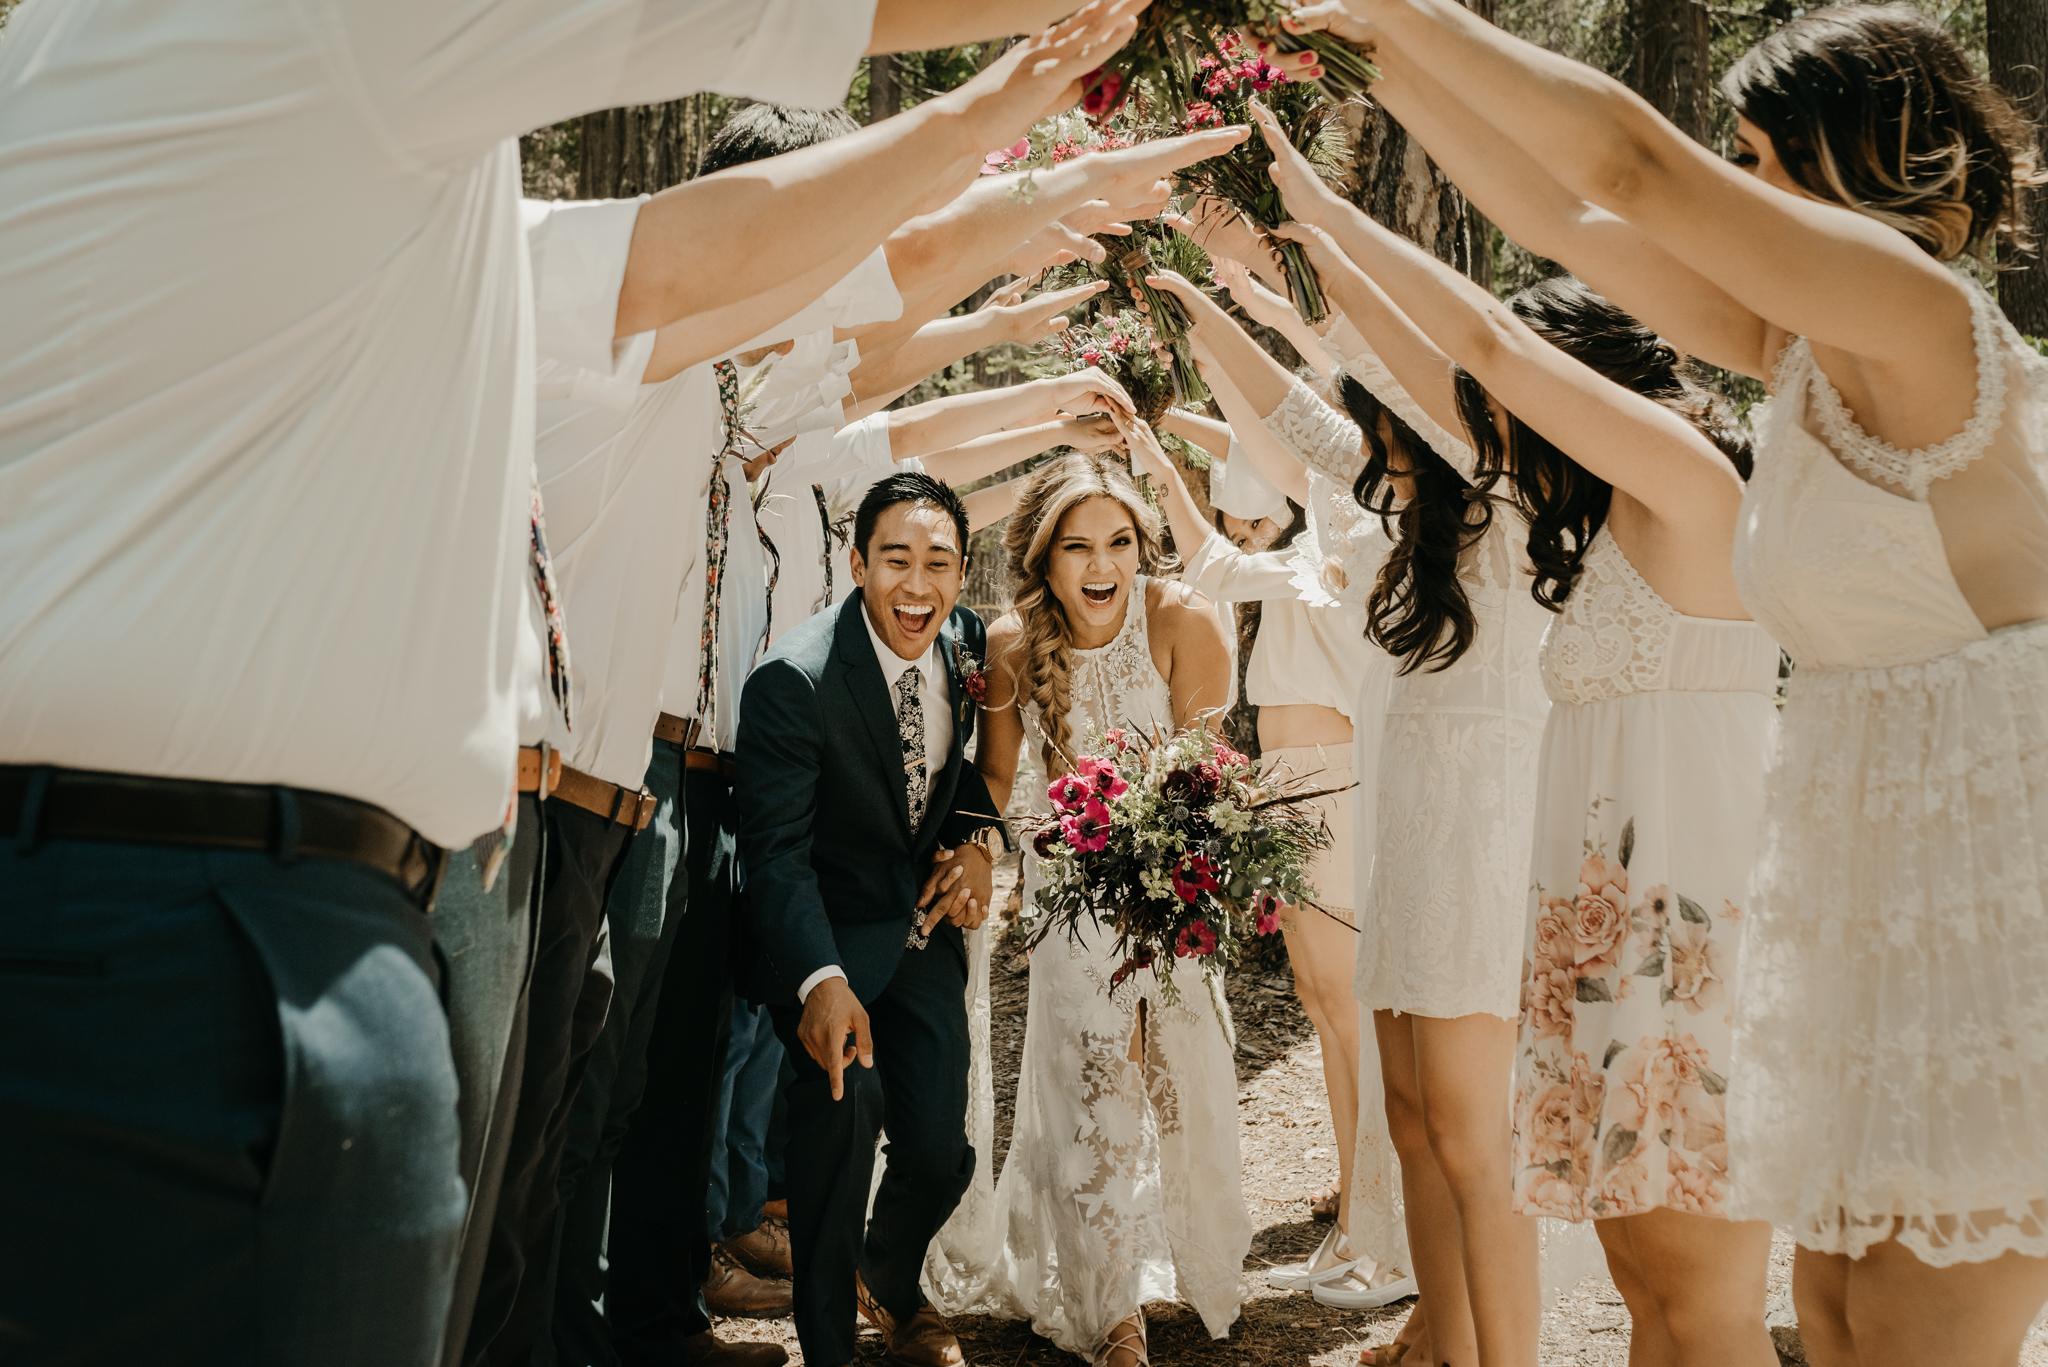 © Isaiah + Taylor Photography - Evergreen Lodge Destination Yoesmite Wedding - Los Angeles Wedding Photographer-098.jpg